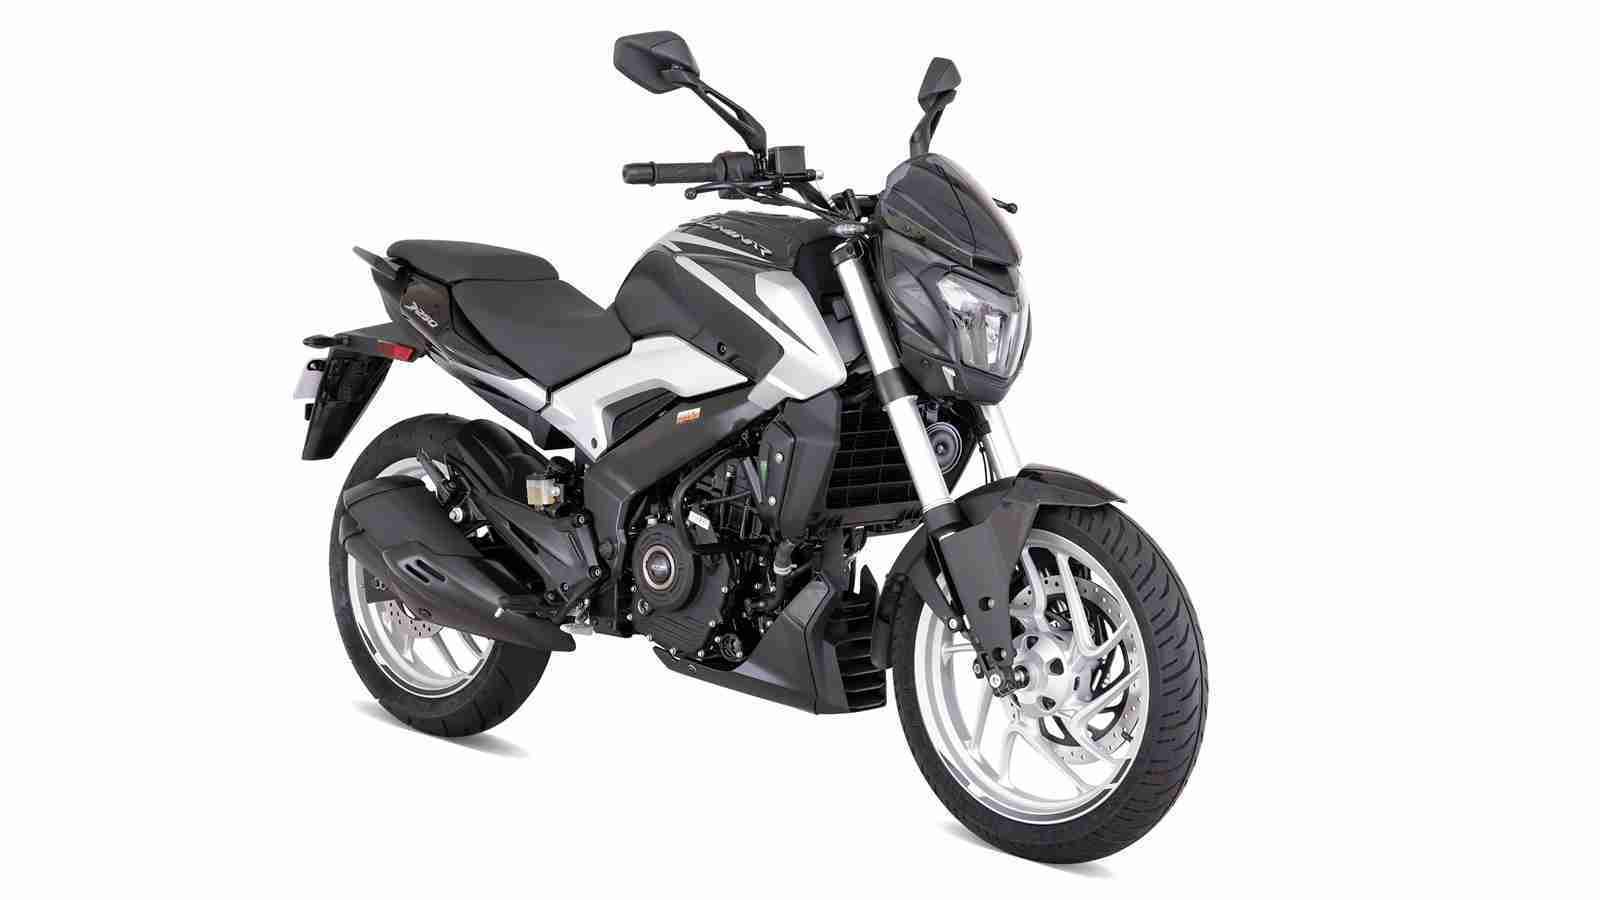 Dominar 250 colour option Sparkling Black + Matt Silver